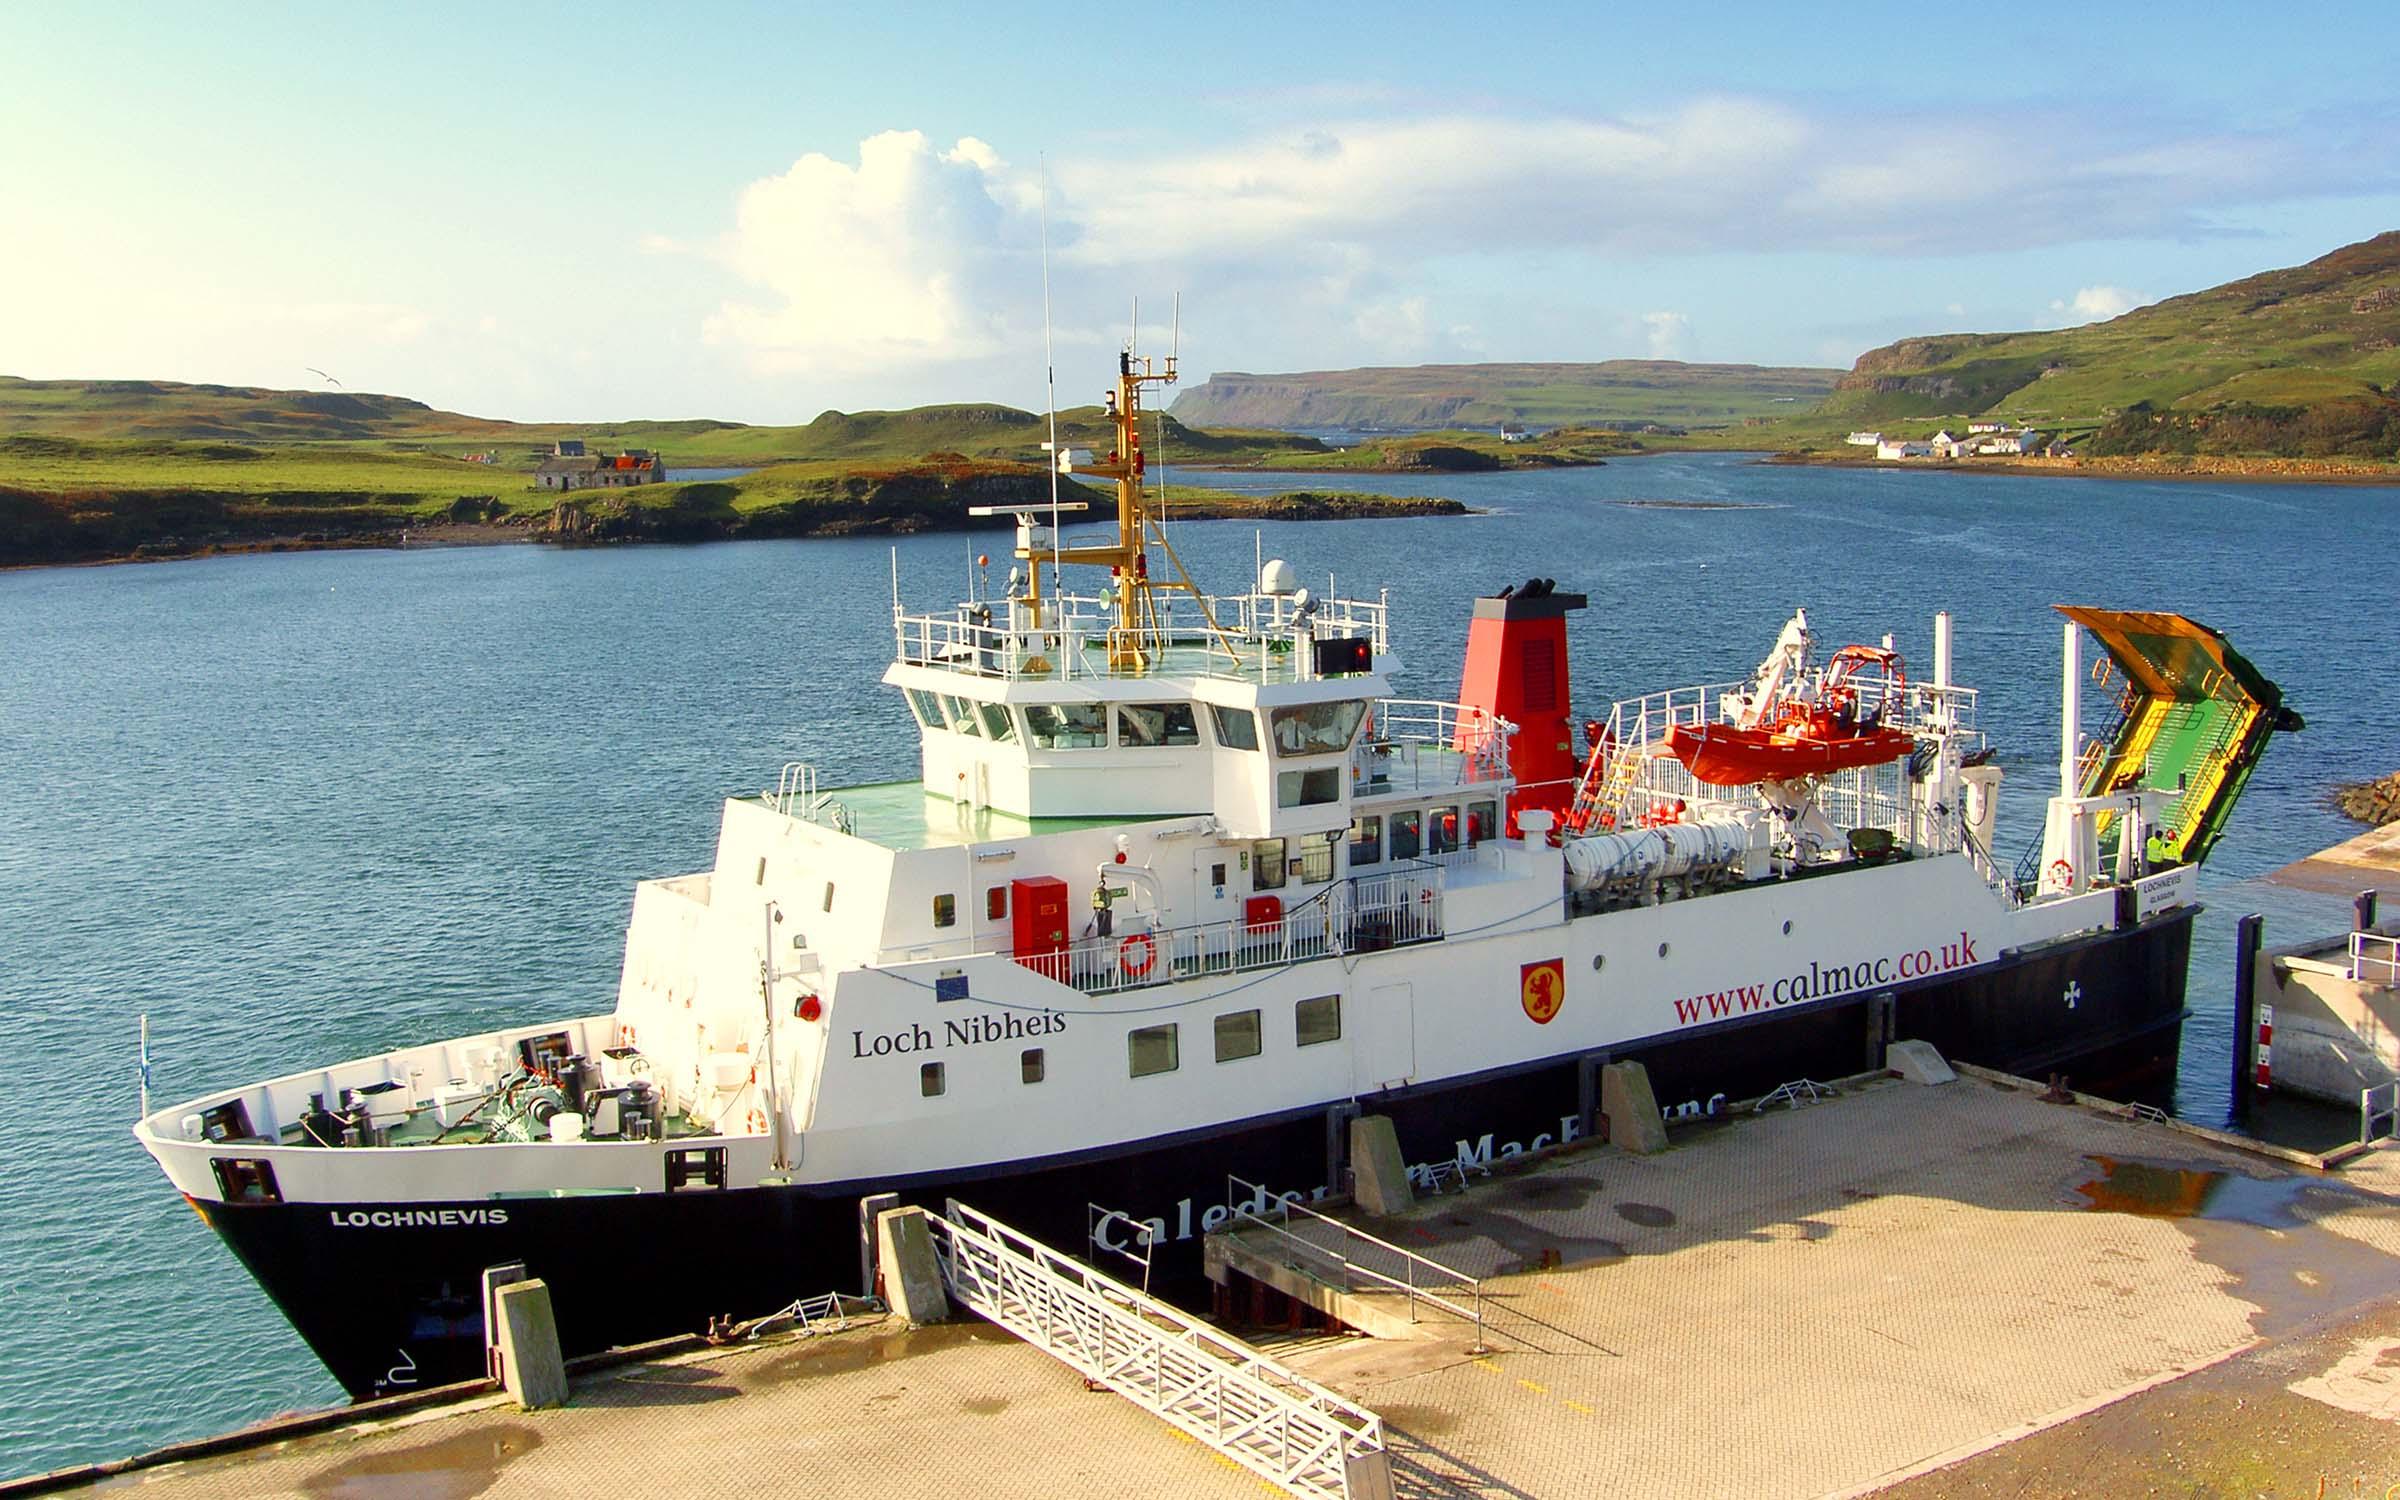 Lochnevis alongside at Canna (Ships of CalMac)